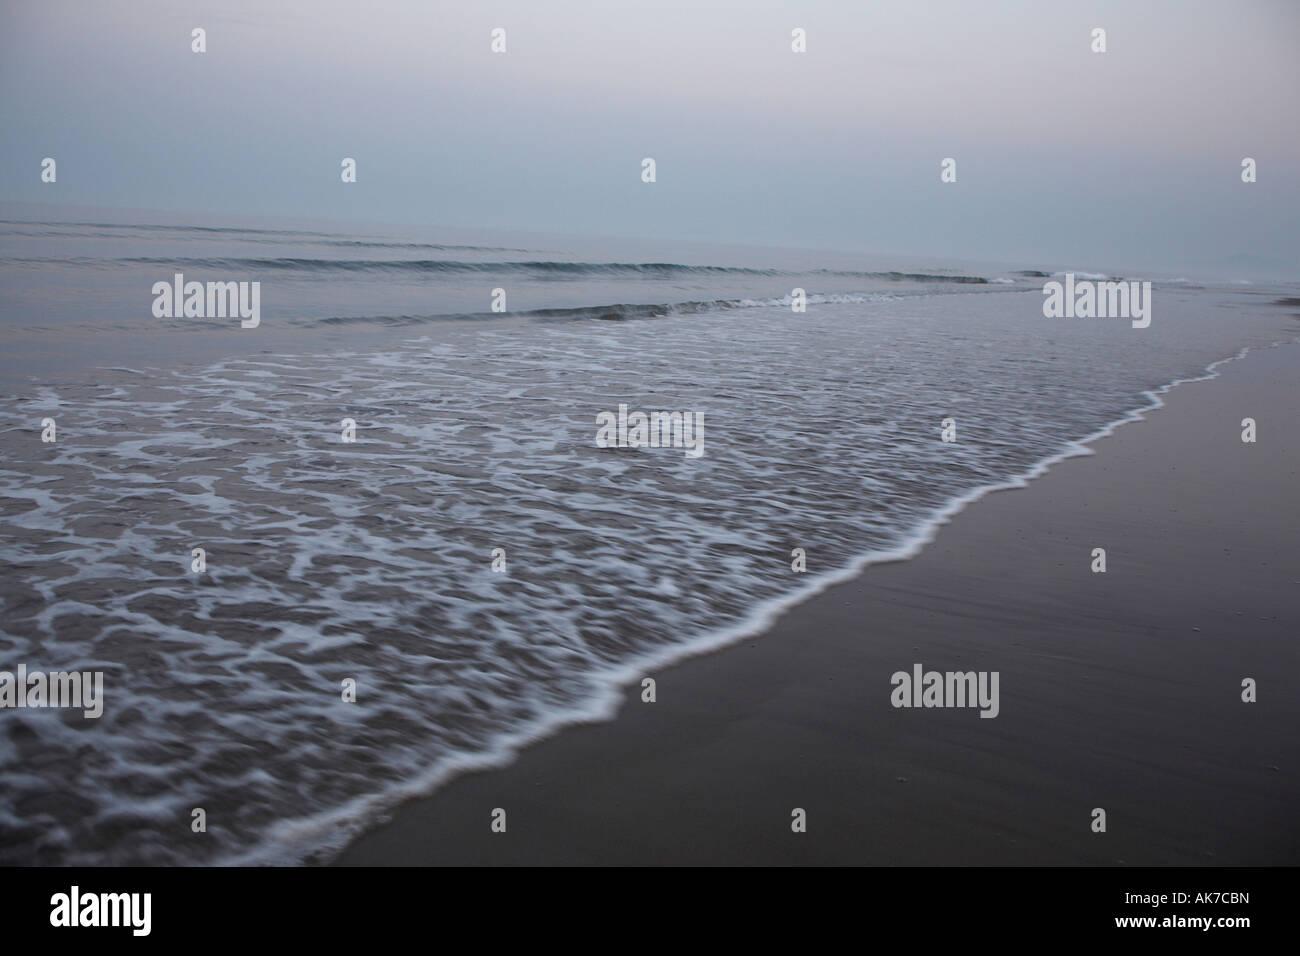 Waves rushing over sand Stock Photo